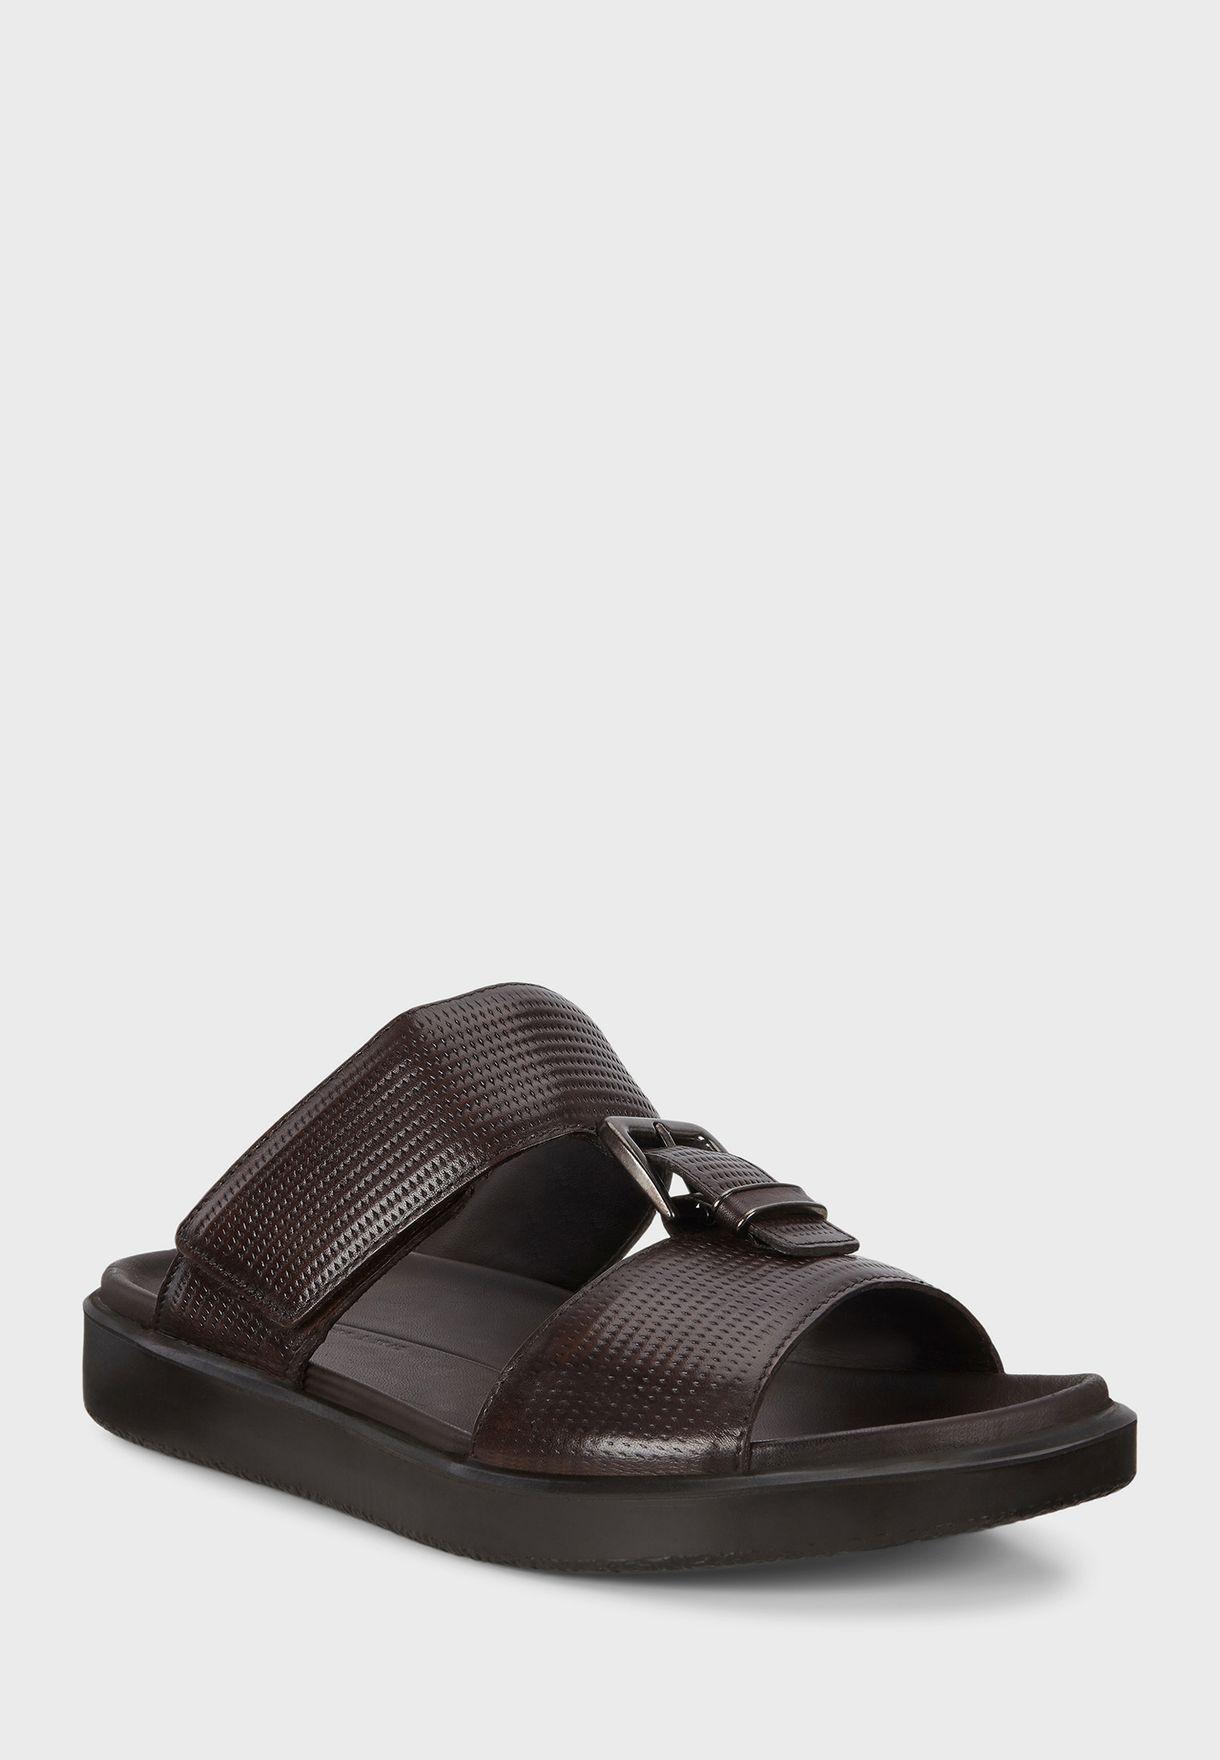 Buckle Detail Sandals